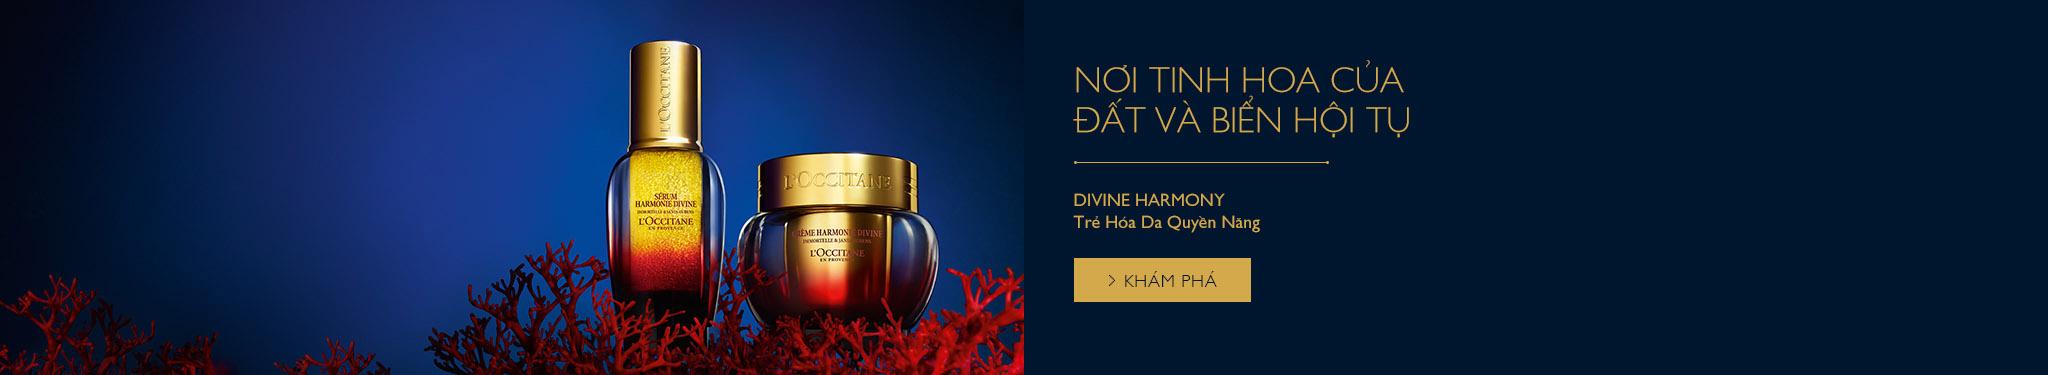 Bộ sản phẩm Divine Harmony